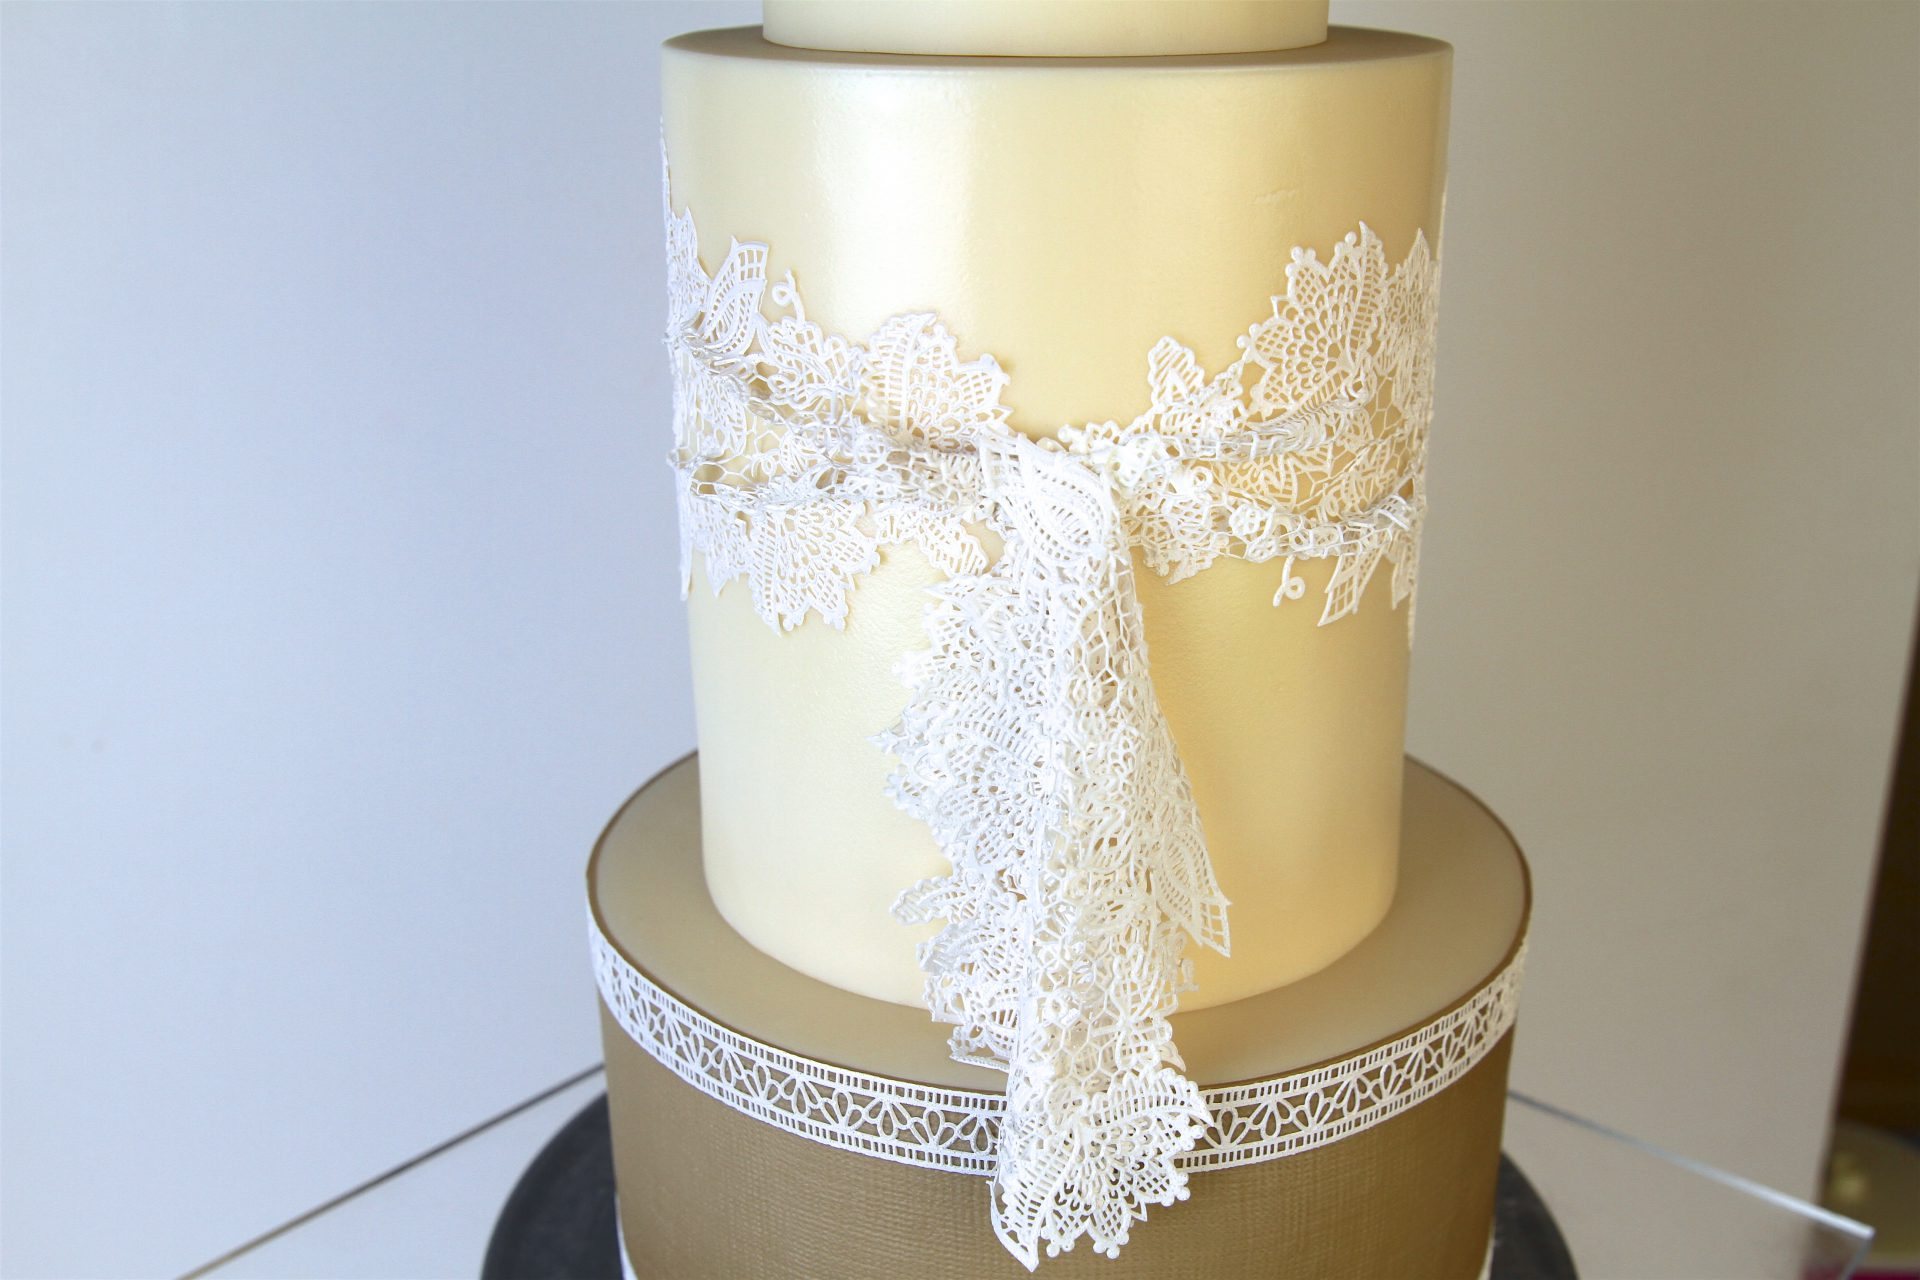 CMM FEB18 - Shabby Chic Cake - Iris Eger, Ribiselchen